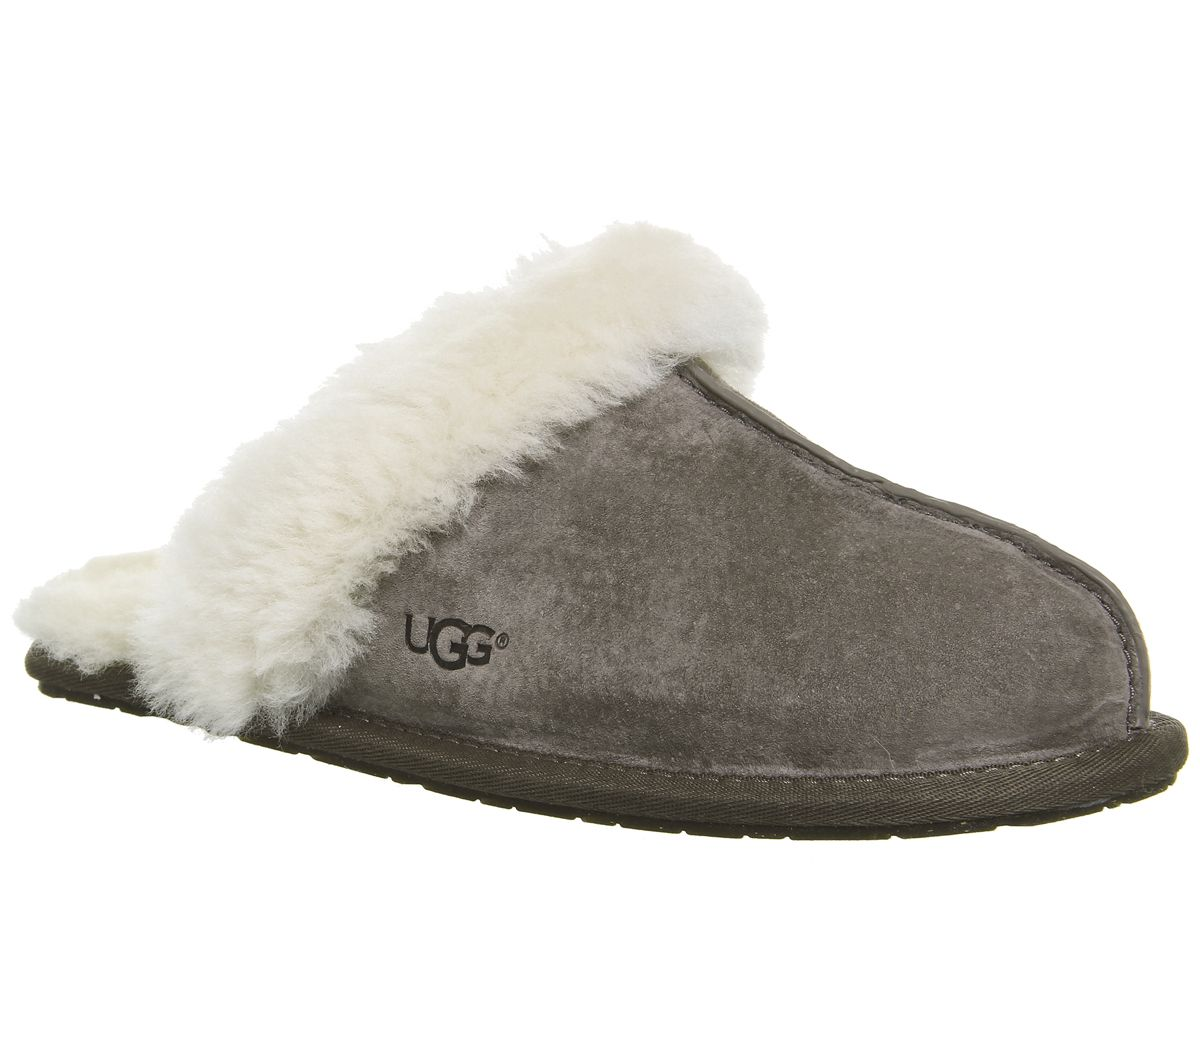 148100378e56 UGG Scuffette II Stormy Grey - Flats